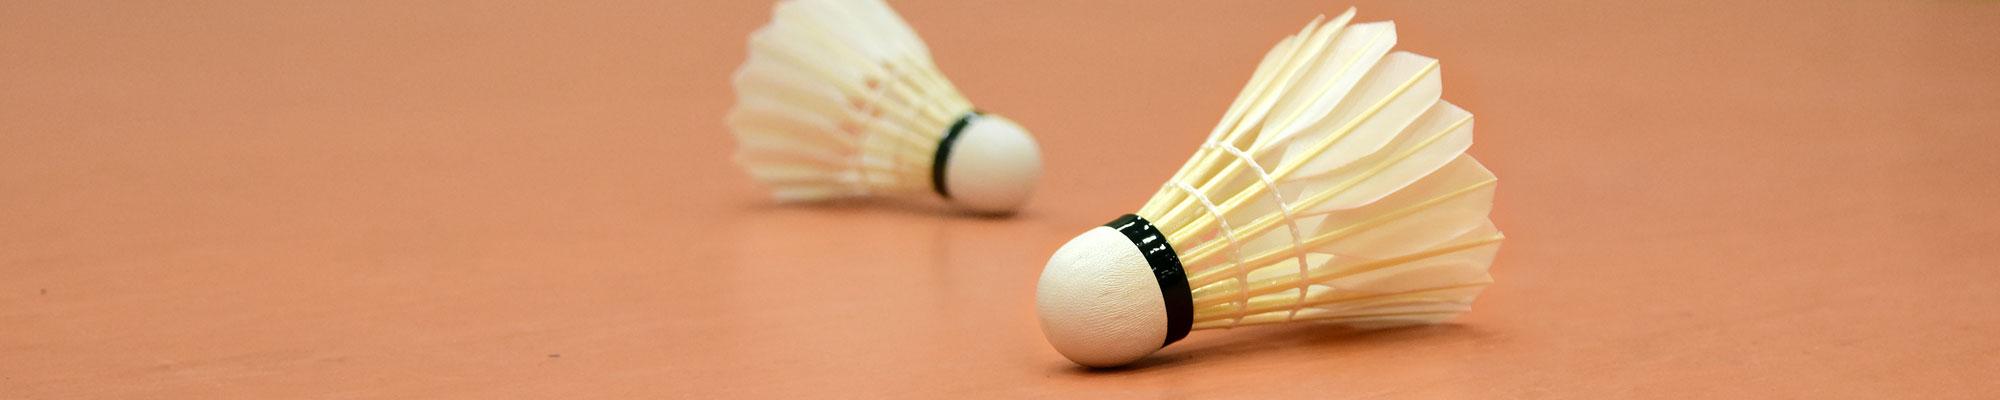 banner-badminton